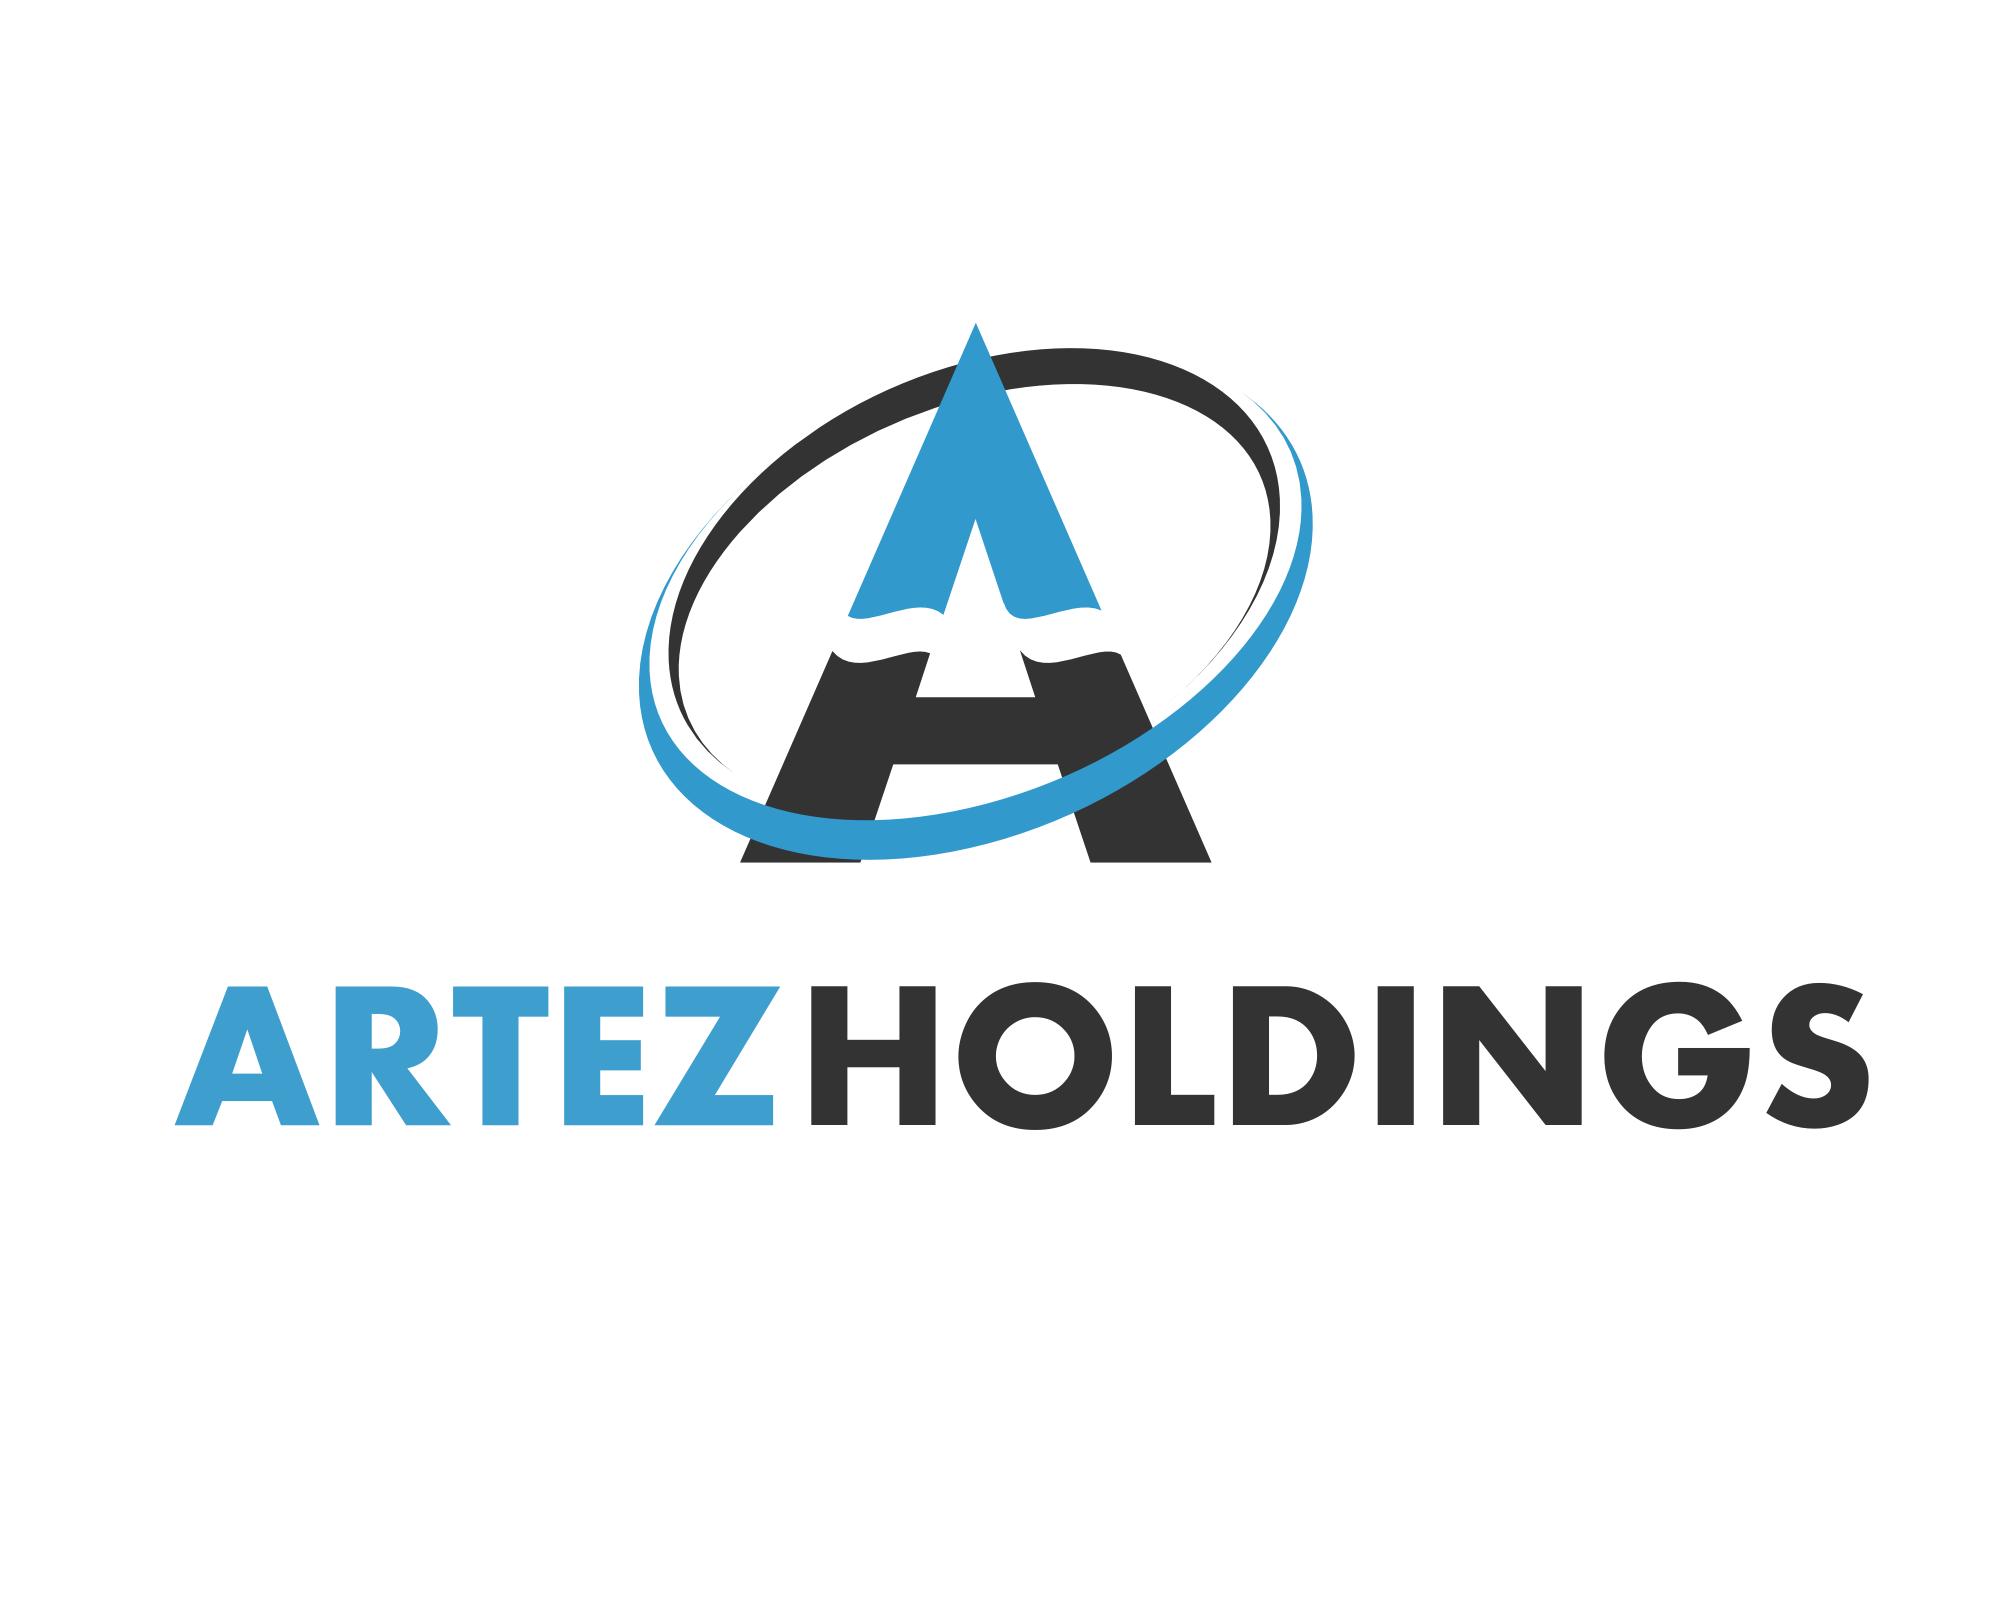 Logo Design by explogos - Entry No. 16 in the Logo Design Contest New Logo Design for Artez Holdings.